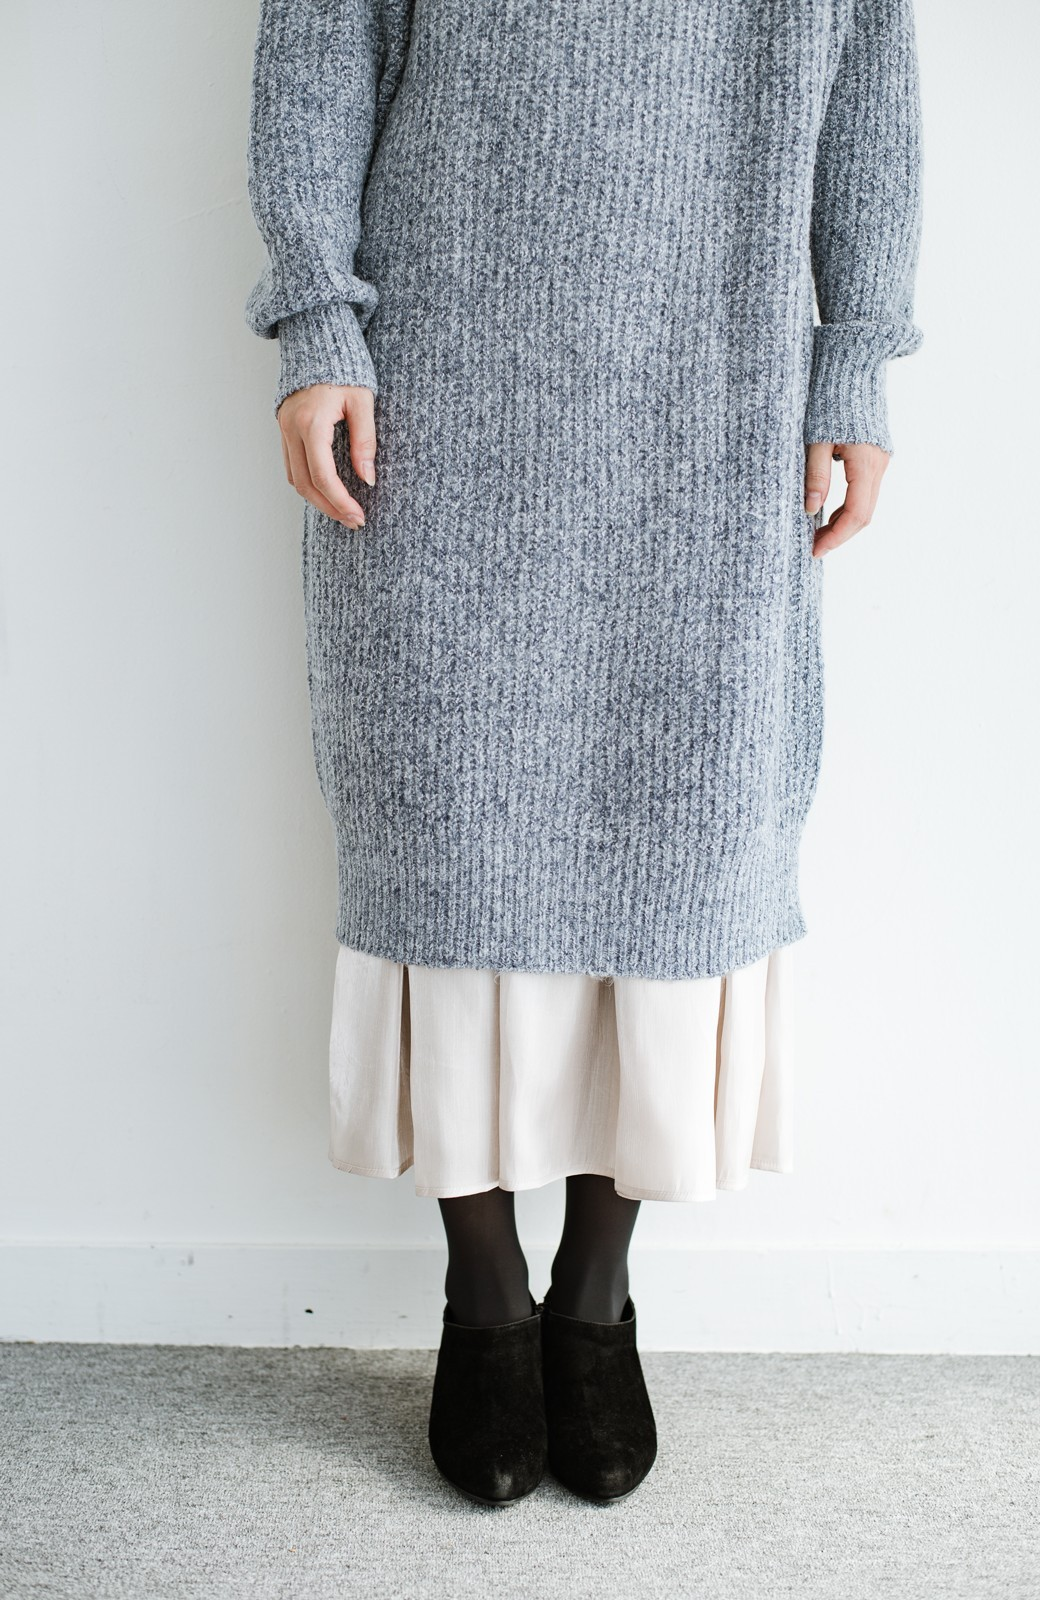 haco! 【人気のため新色追加!】1枚でも重ね着にも便利なキラキラ素材がかわいいロングスカート by laulea <アイボリー>の商品写真10